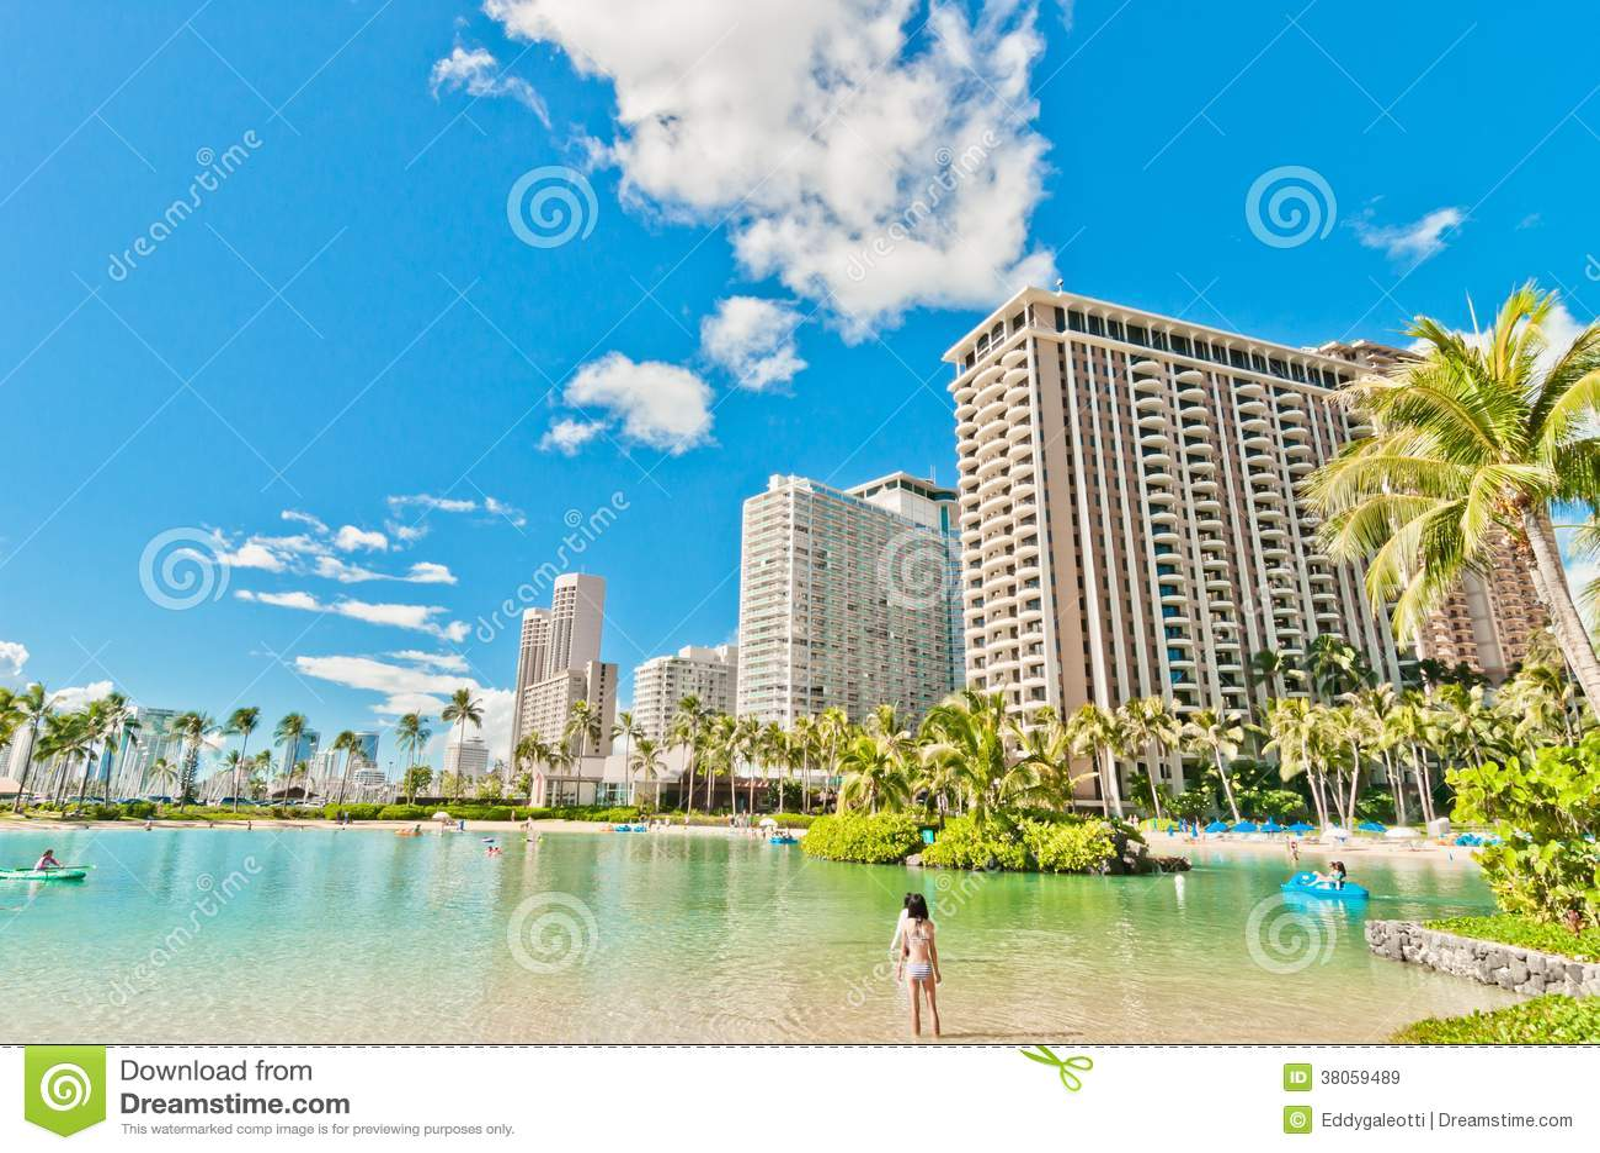 honolulu waikiki beach: